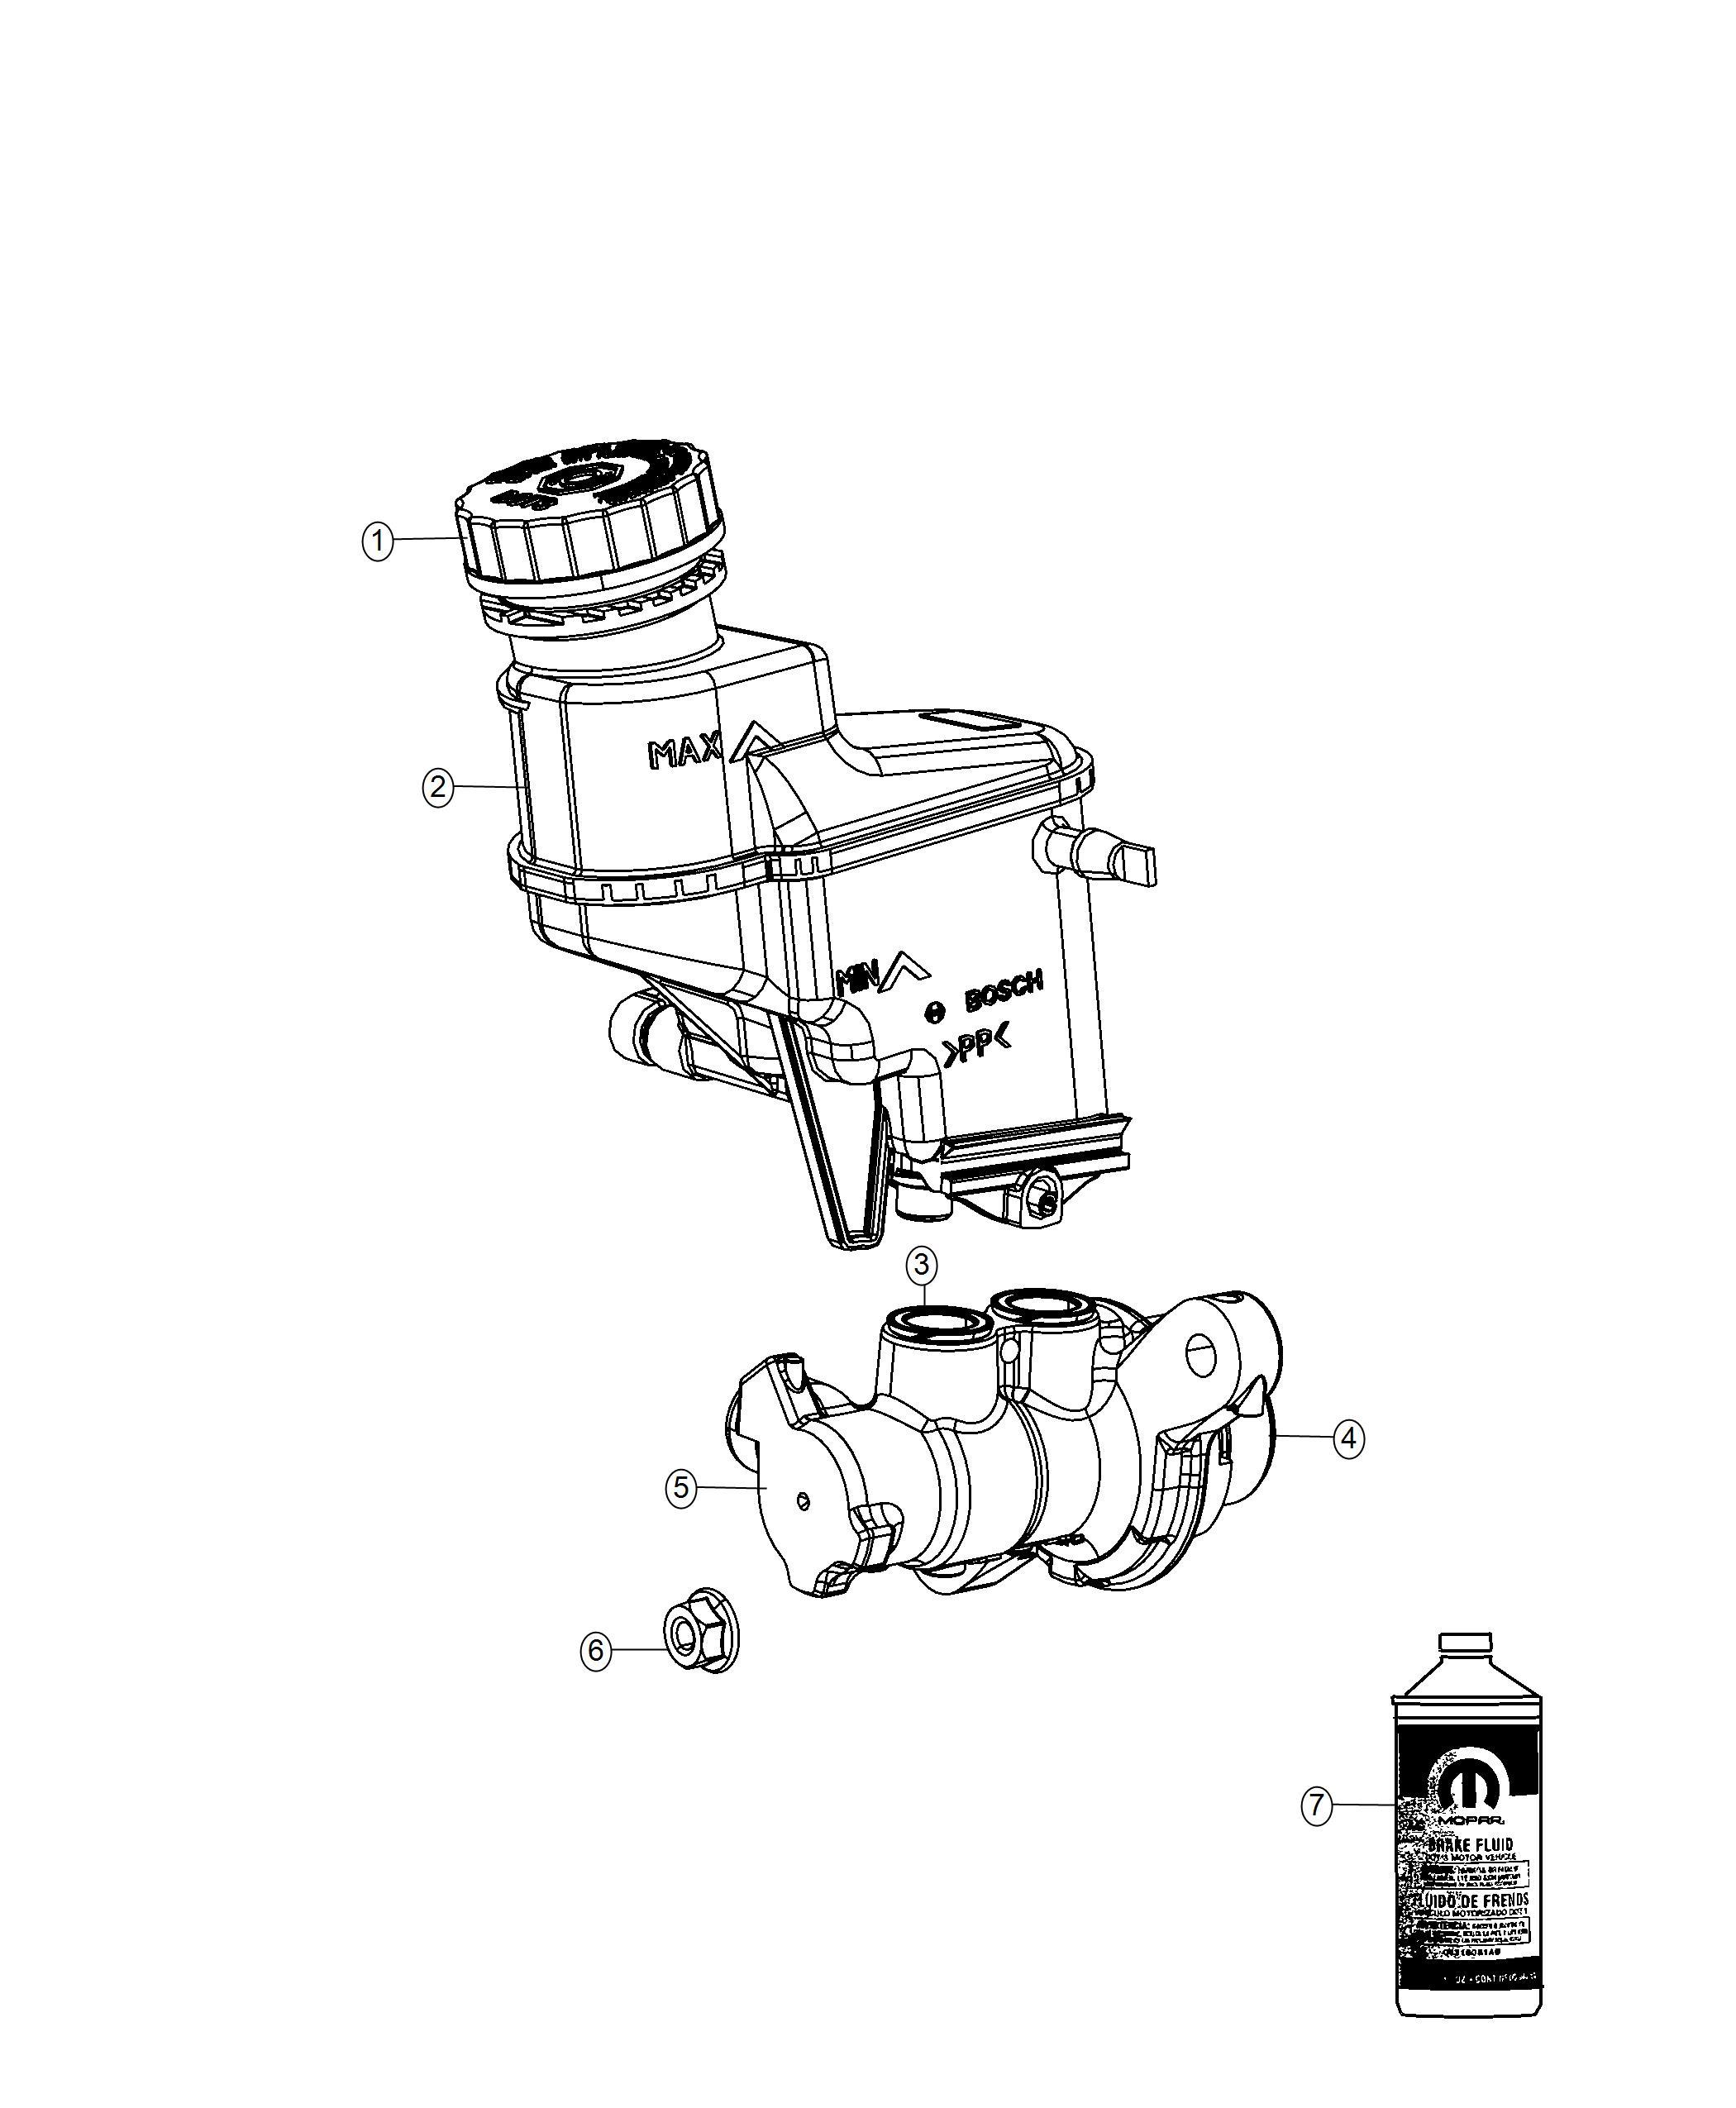 Fiat 500l Master Cylinder Brake Export Mexico 6 Spd